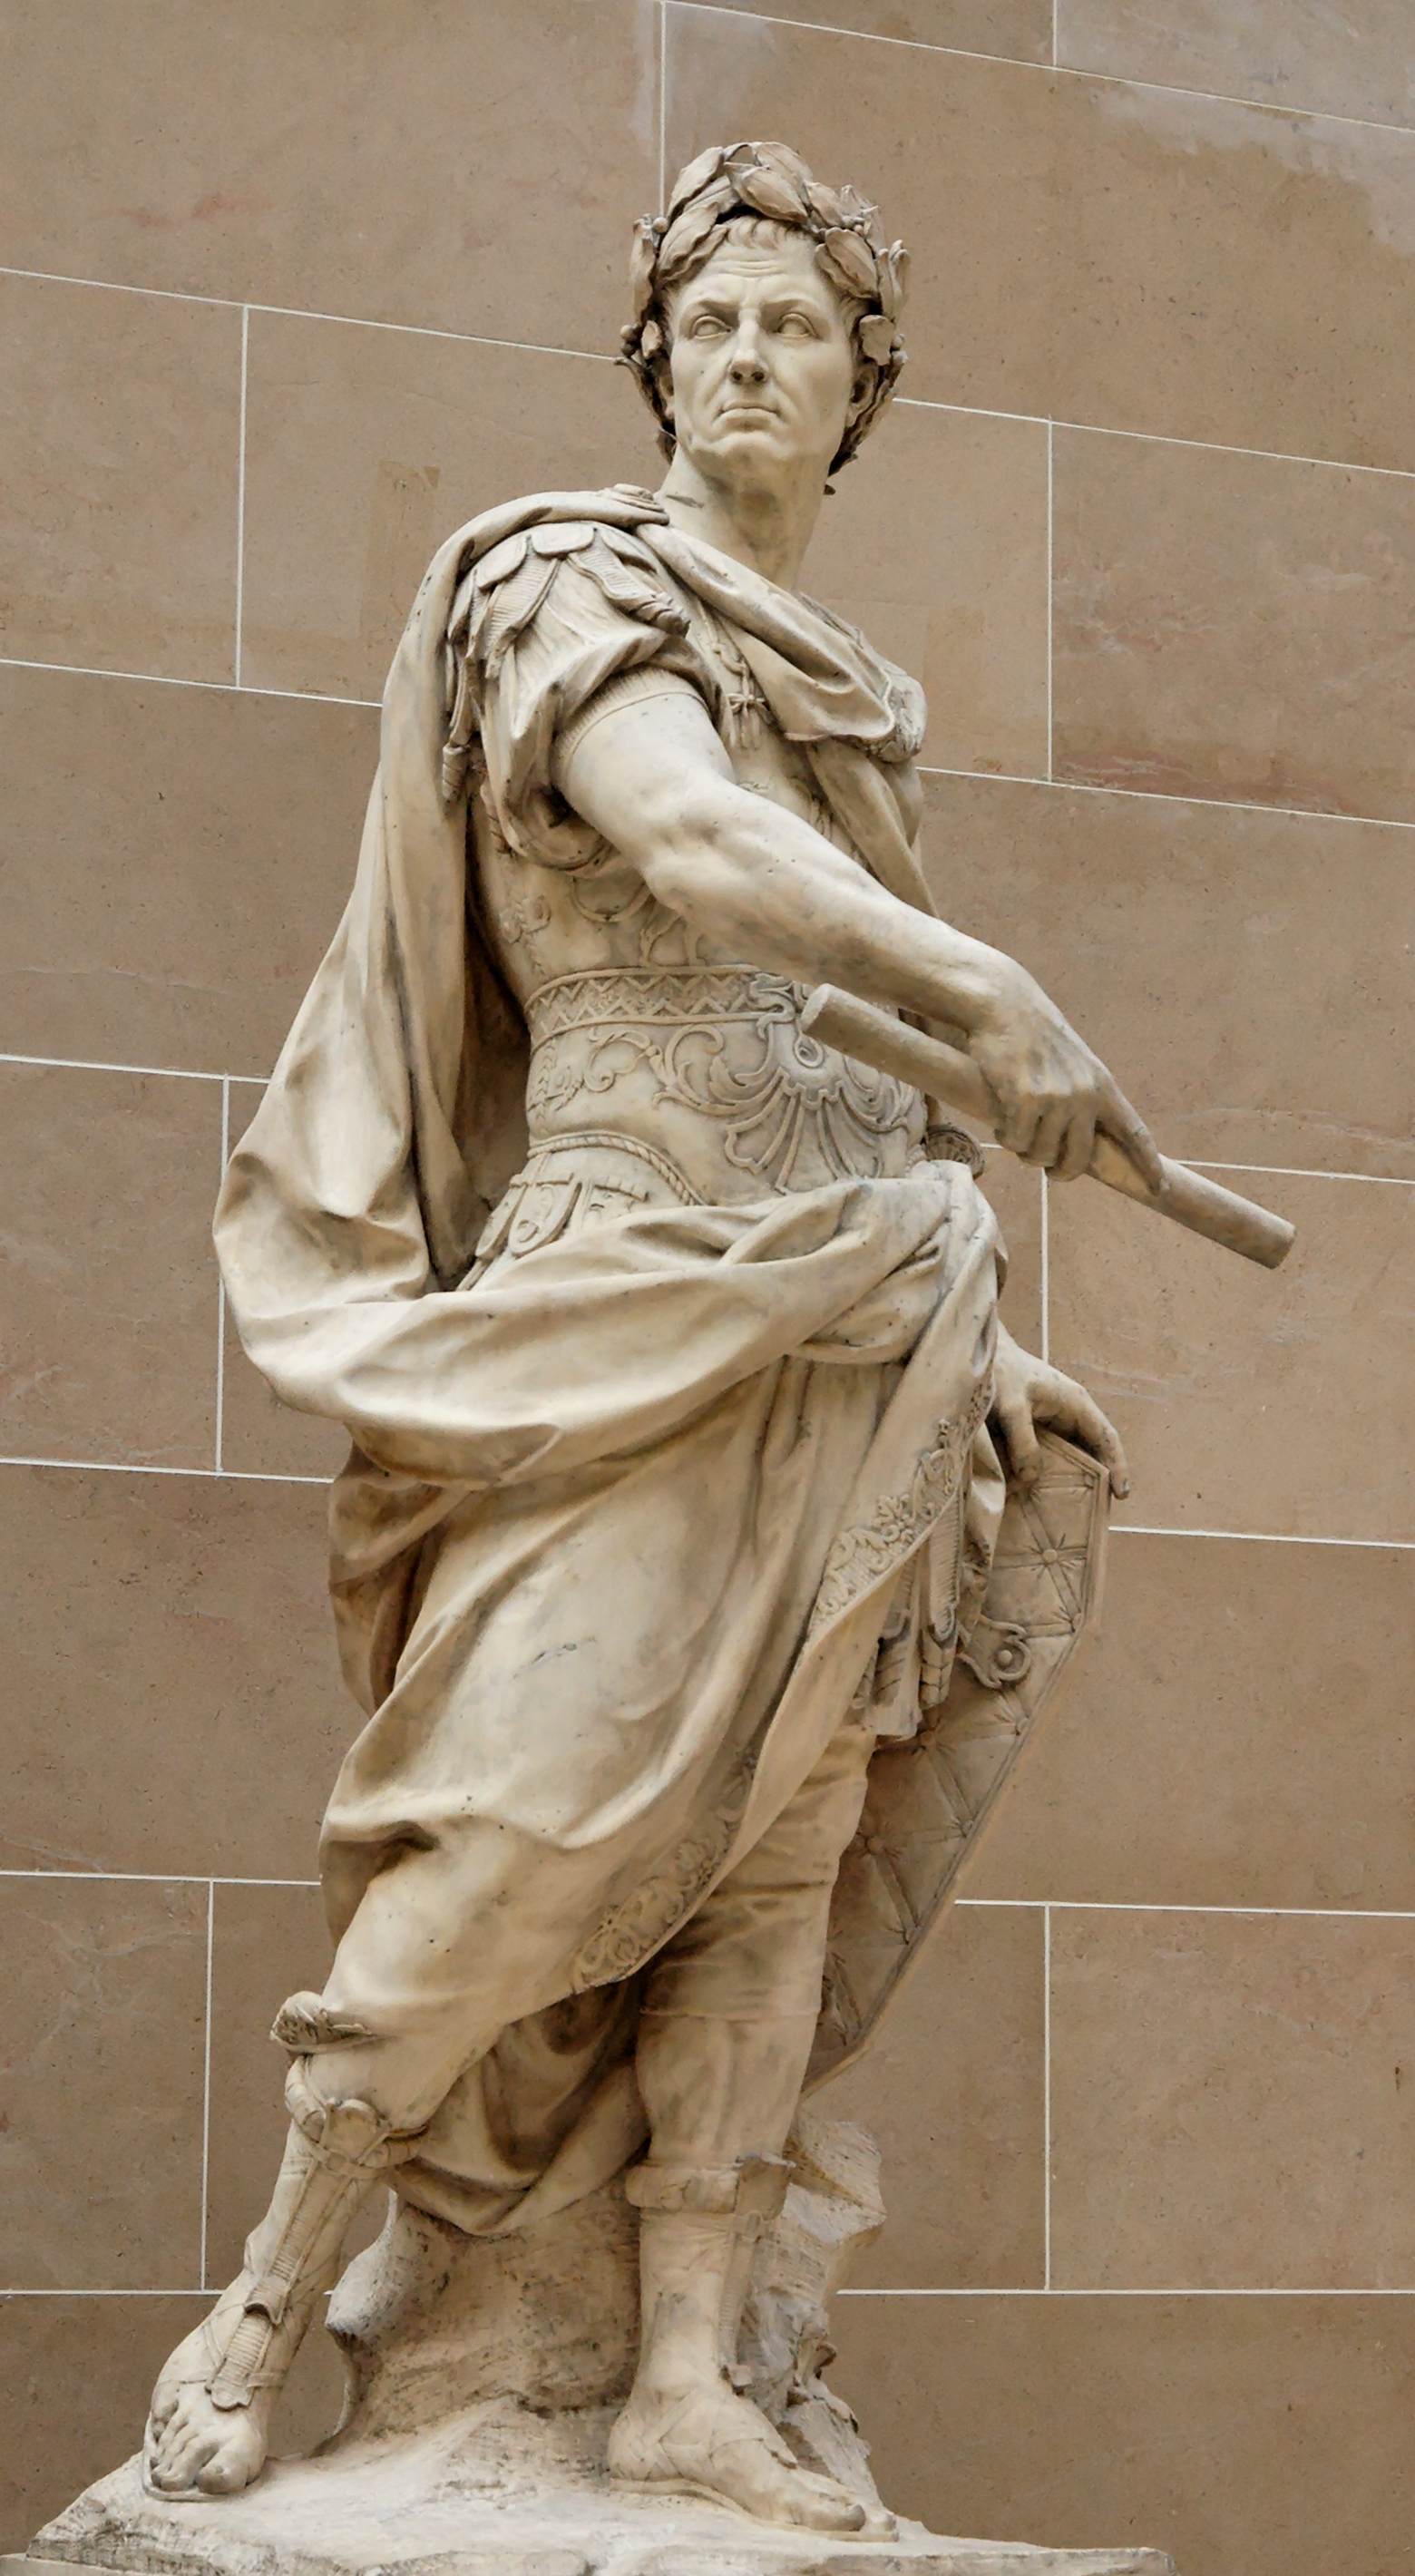 Julius_Caesar_Coustou_Louvre_MR1798.jpg